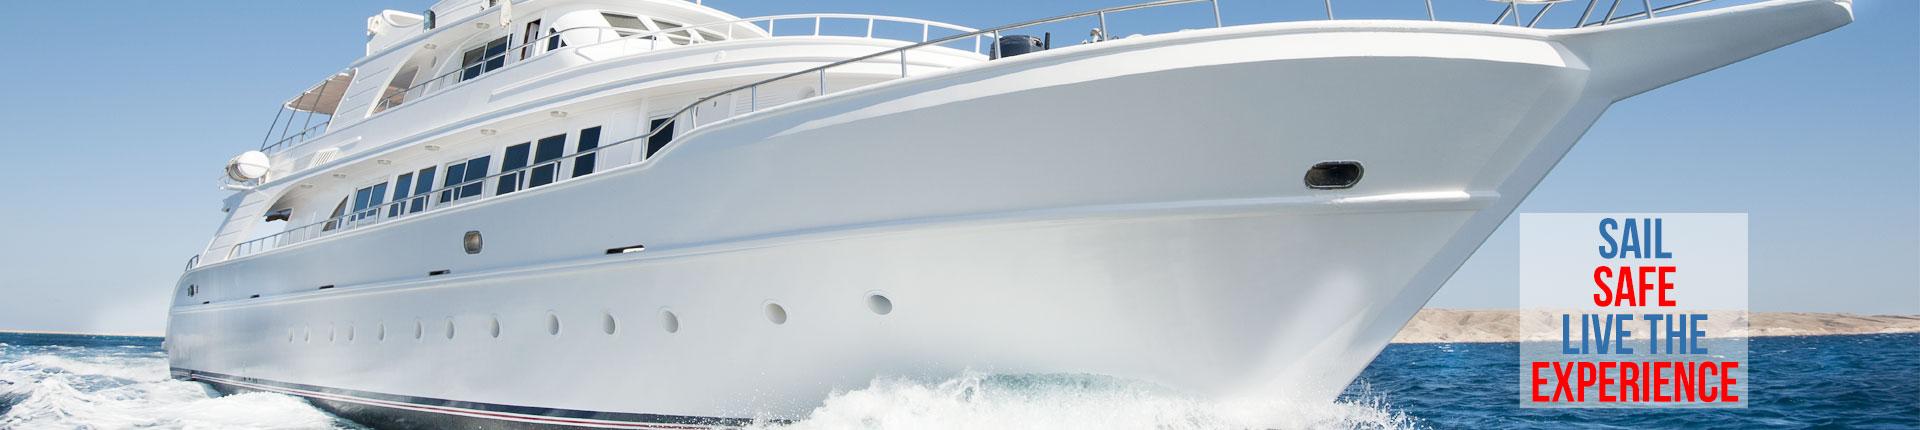 electronaval-yachts-marine-mission2